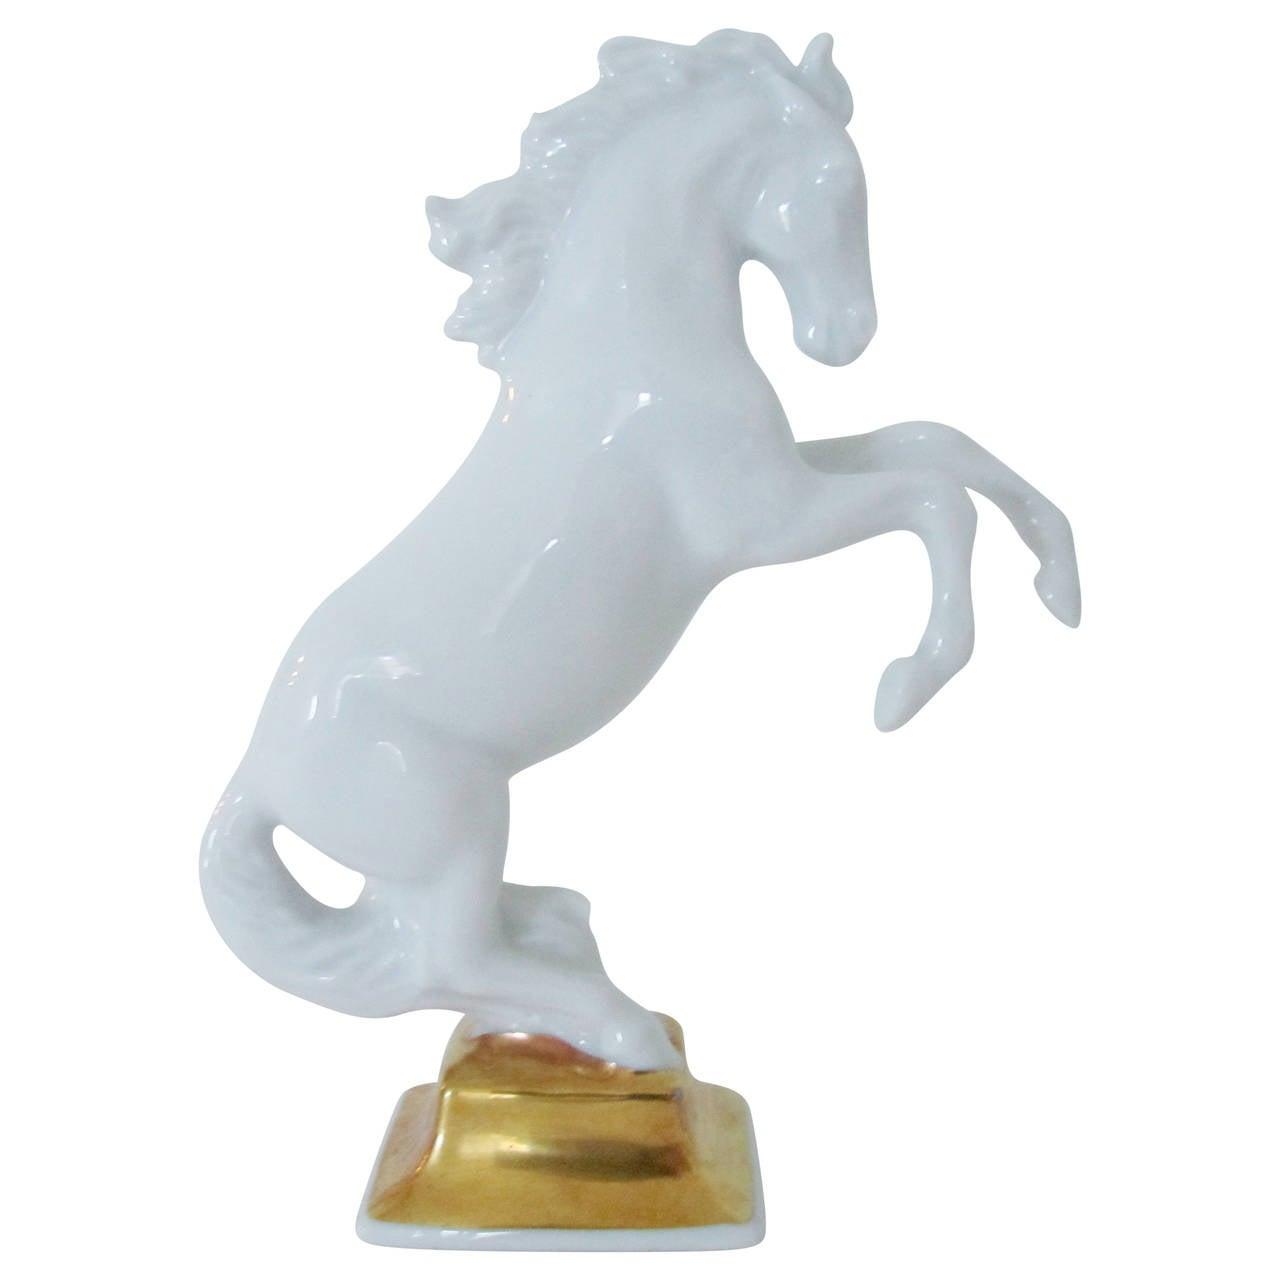 Blanc-de-Chine Porcelain Horse Sculpture by Max Hermann Fritz for Rosenthal